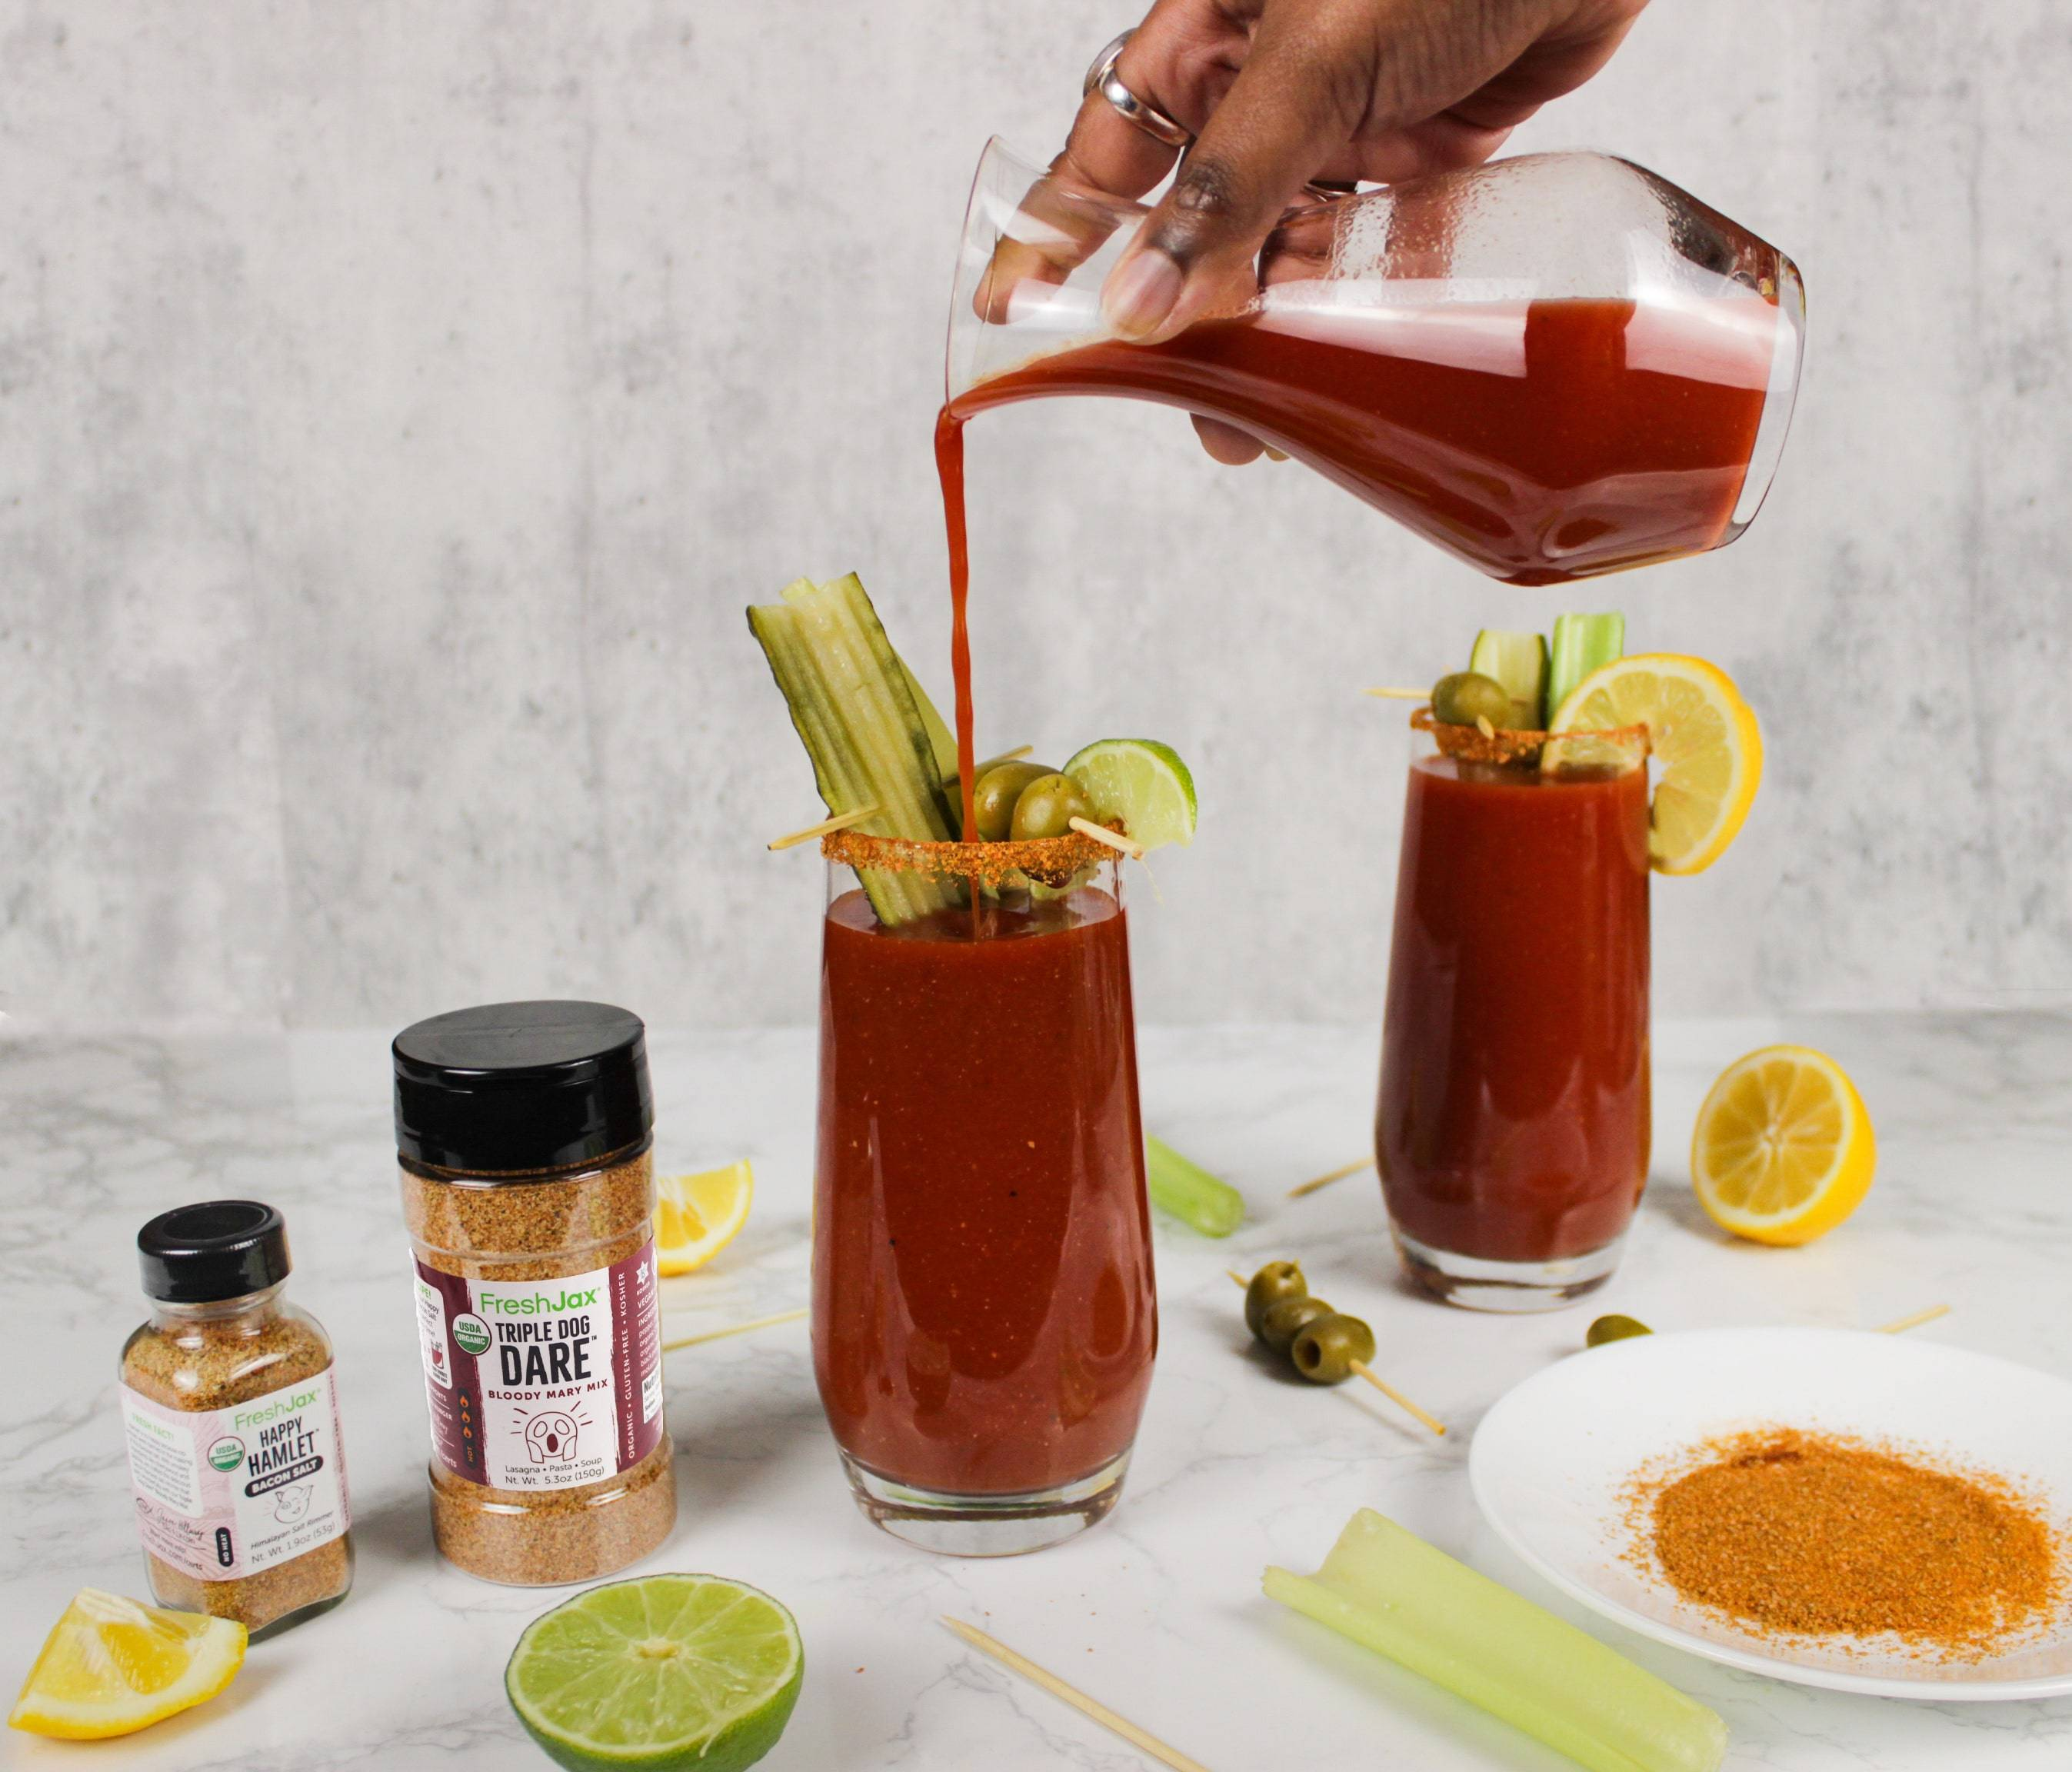 FreshJax Organic Spices Bloody Mary Mix and Bacon Salt